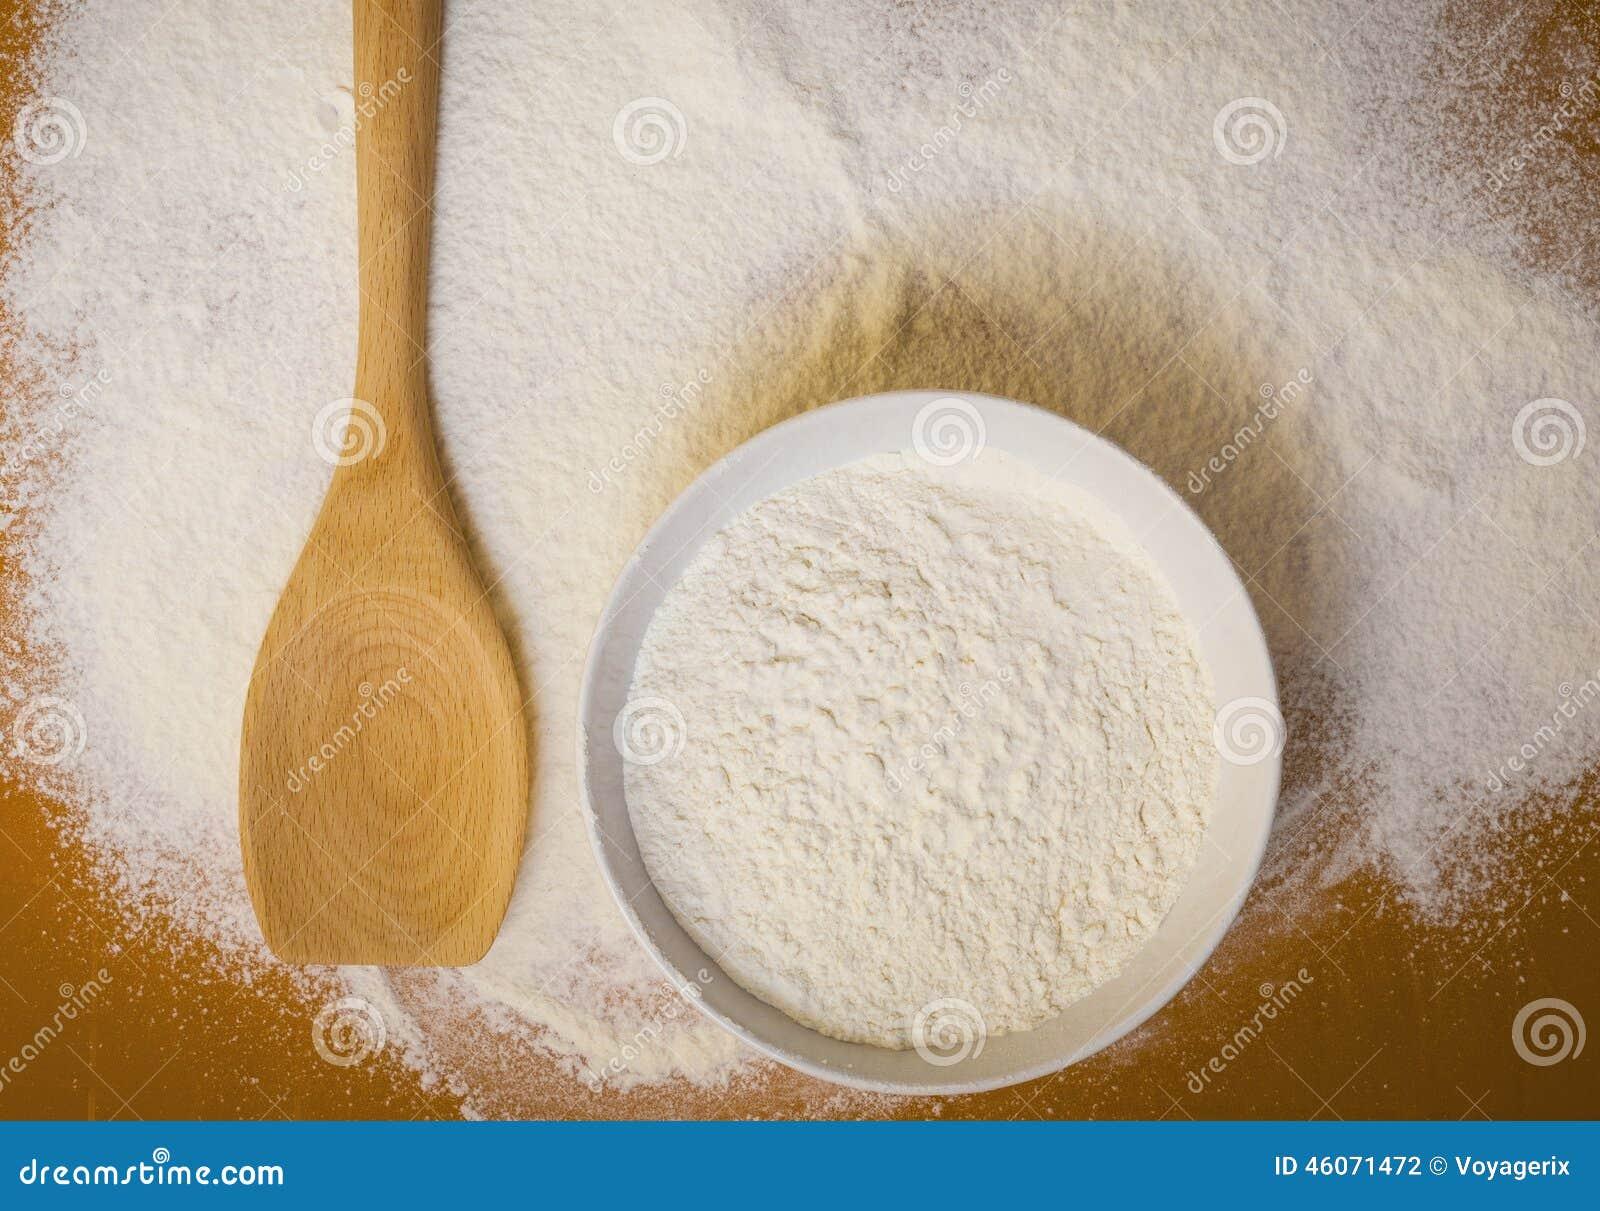 Preparation For Baking Wheat Flour On Table Stock Photo